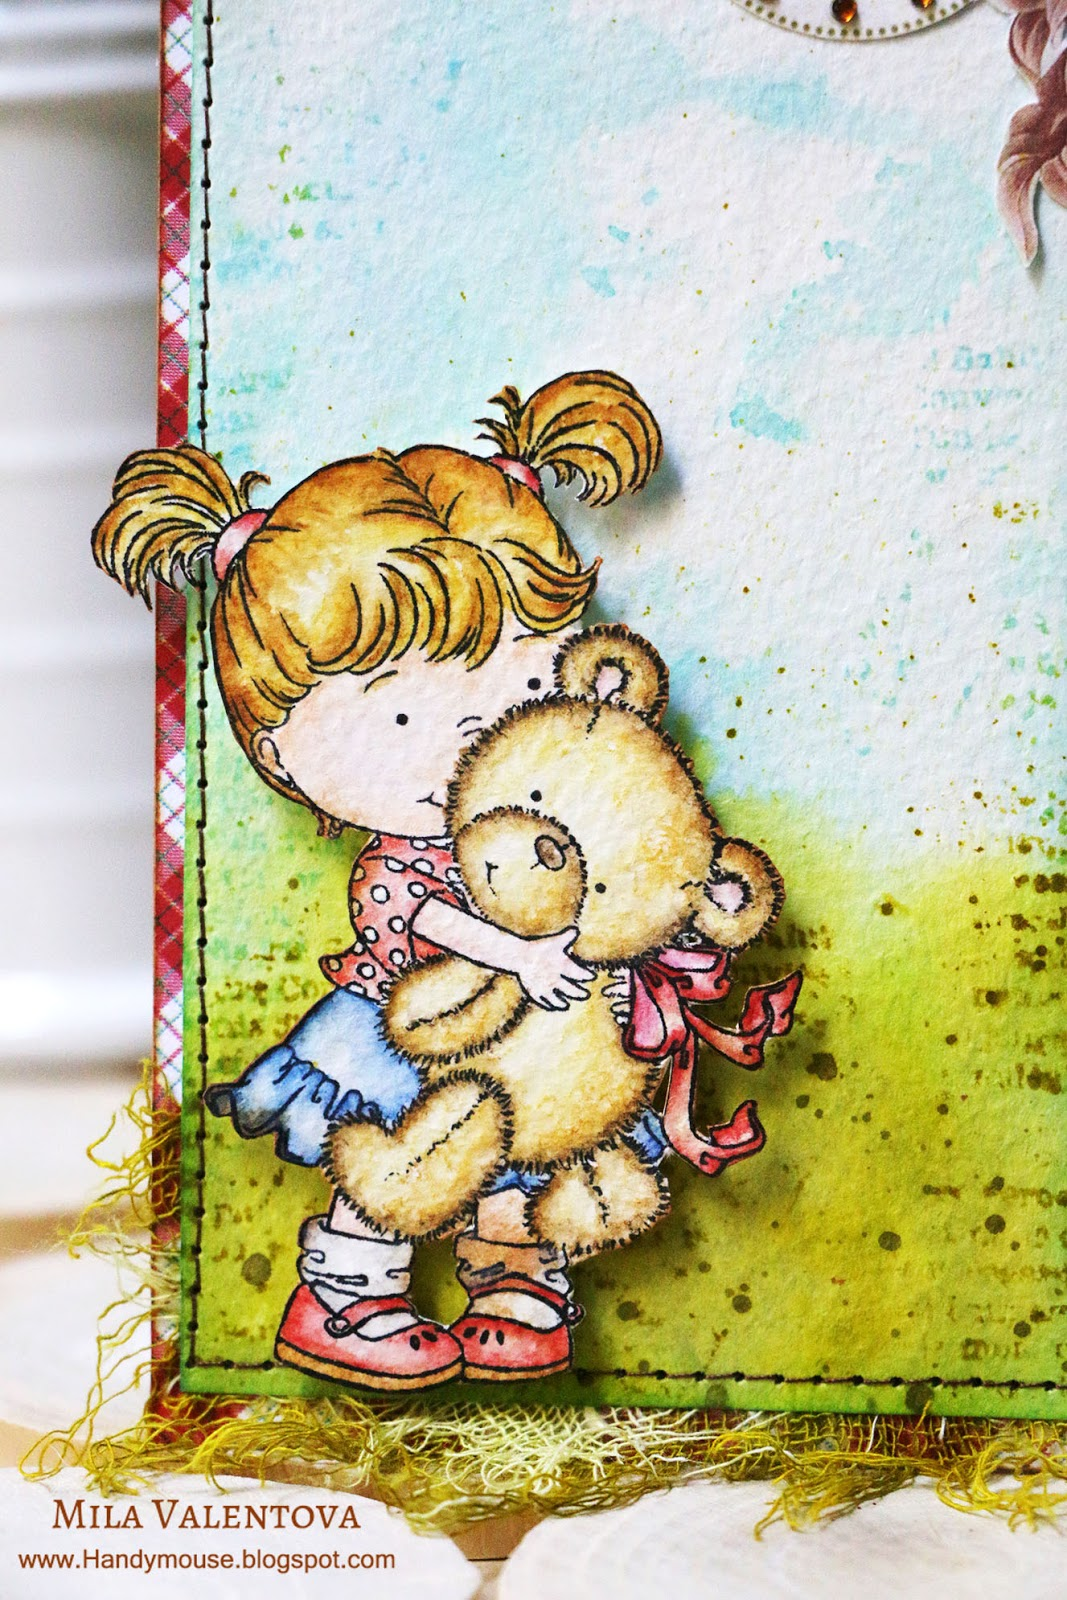 ТЭГ штамп девочка с медвежонком. Мила Валентова.